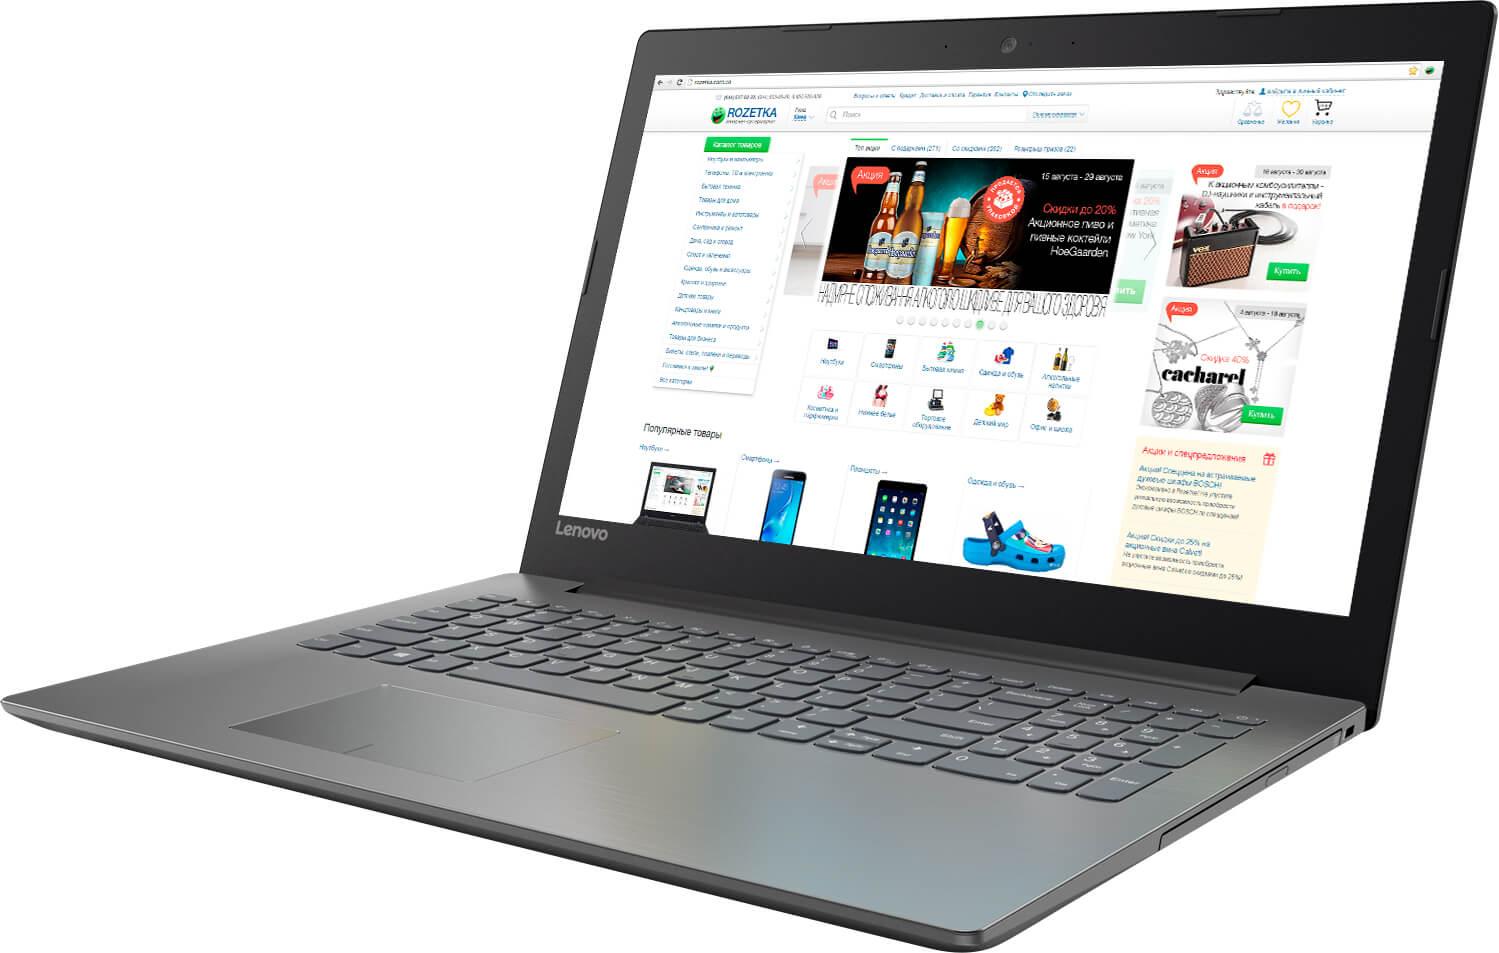 Не работает тачпад на ноутбуке lenovo ideapad 320